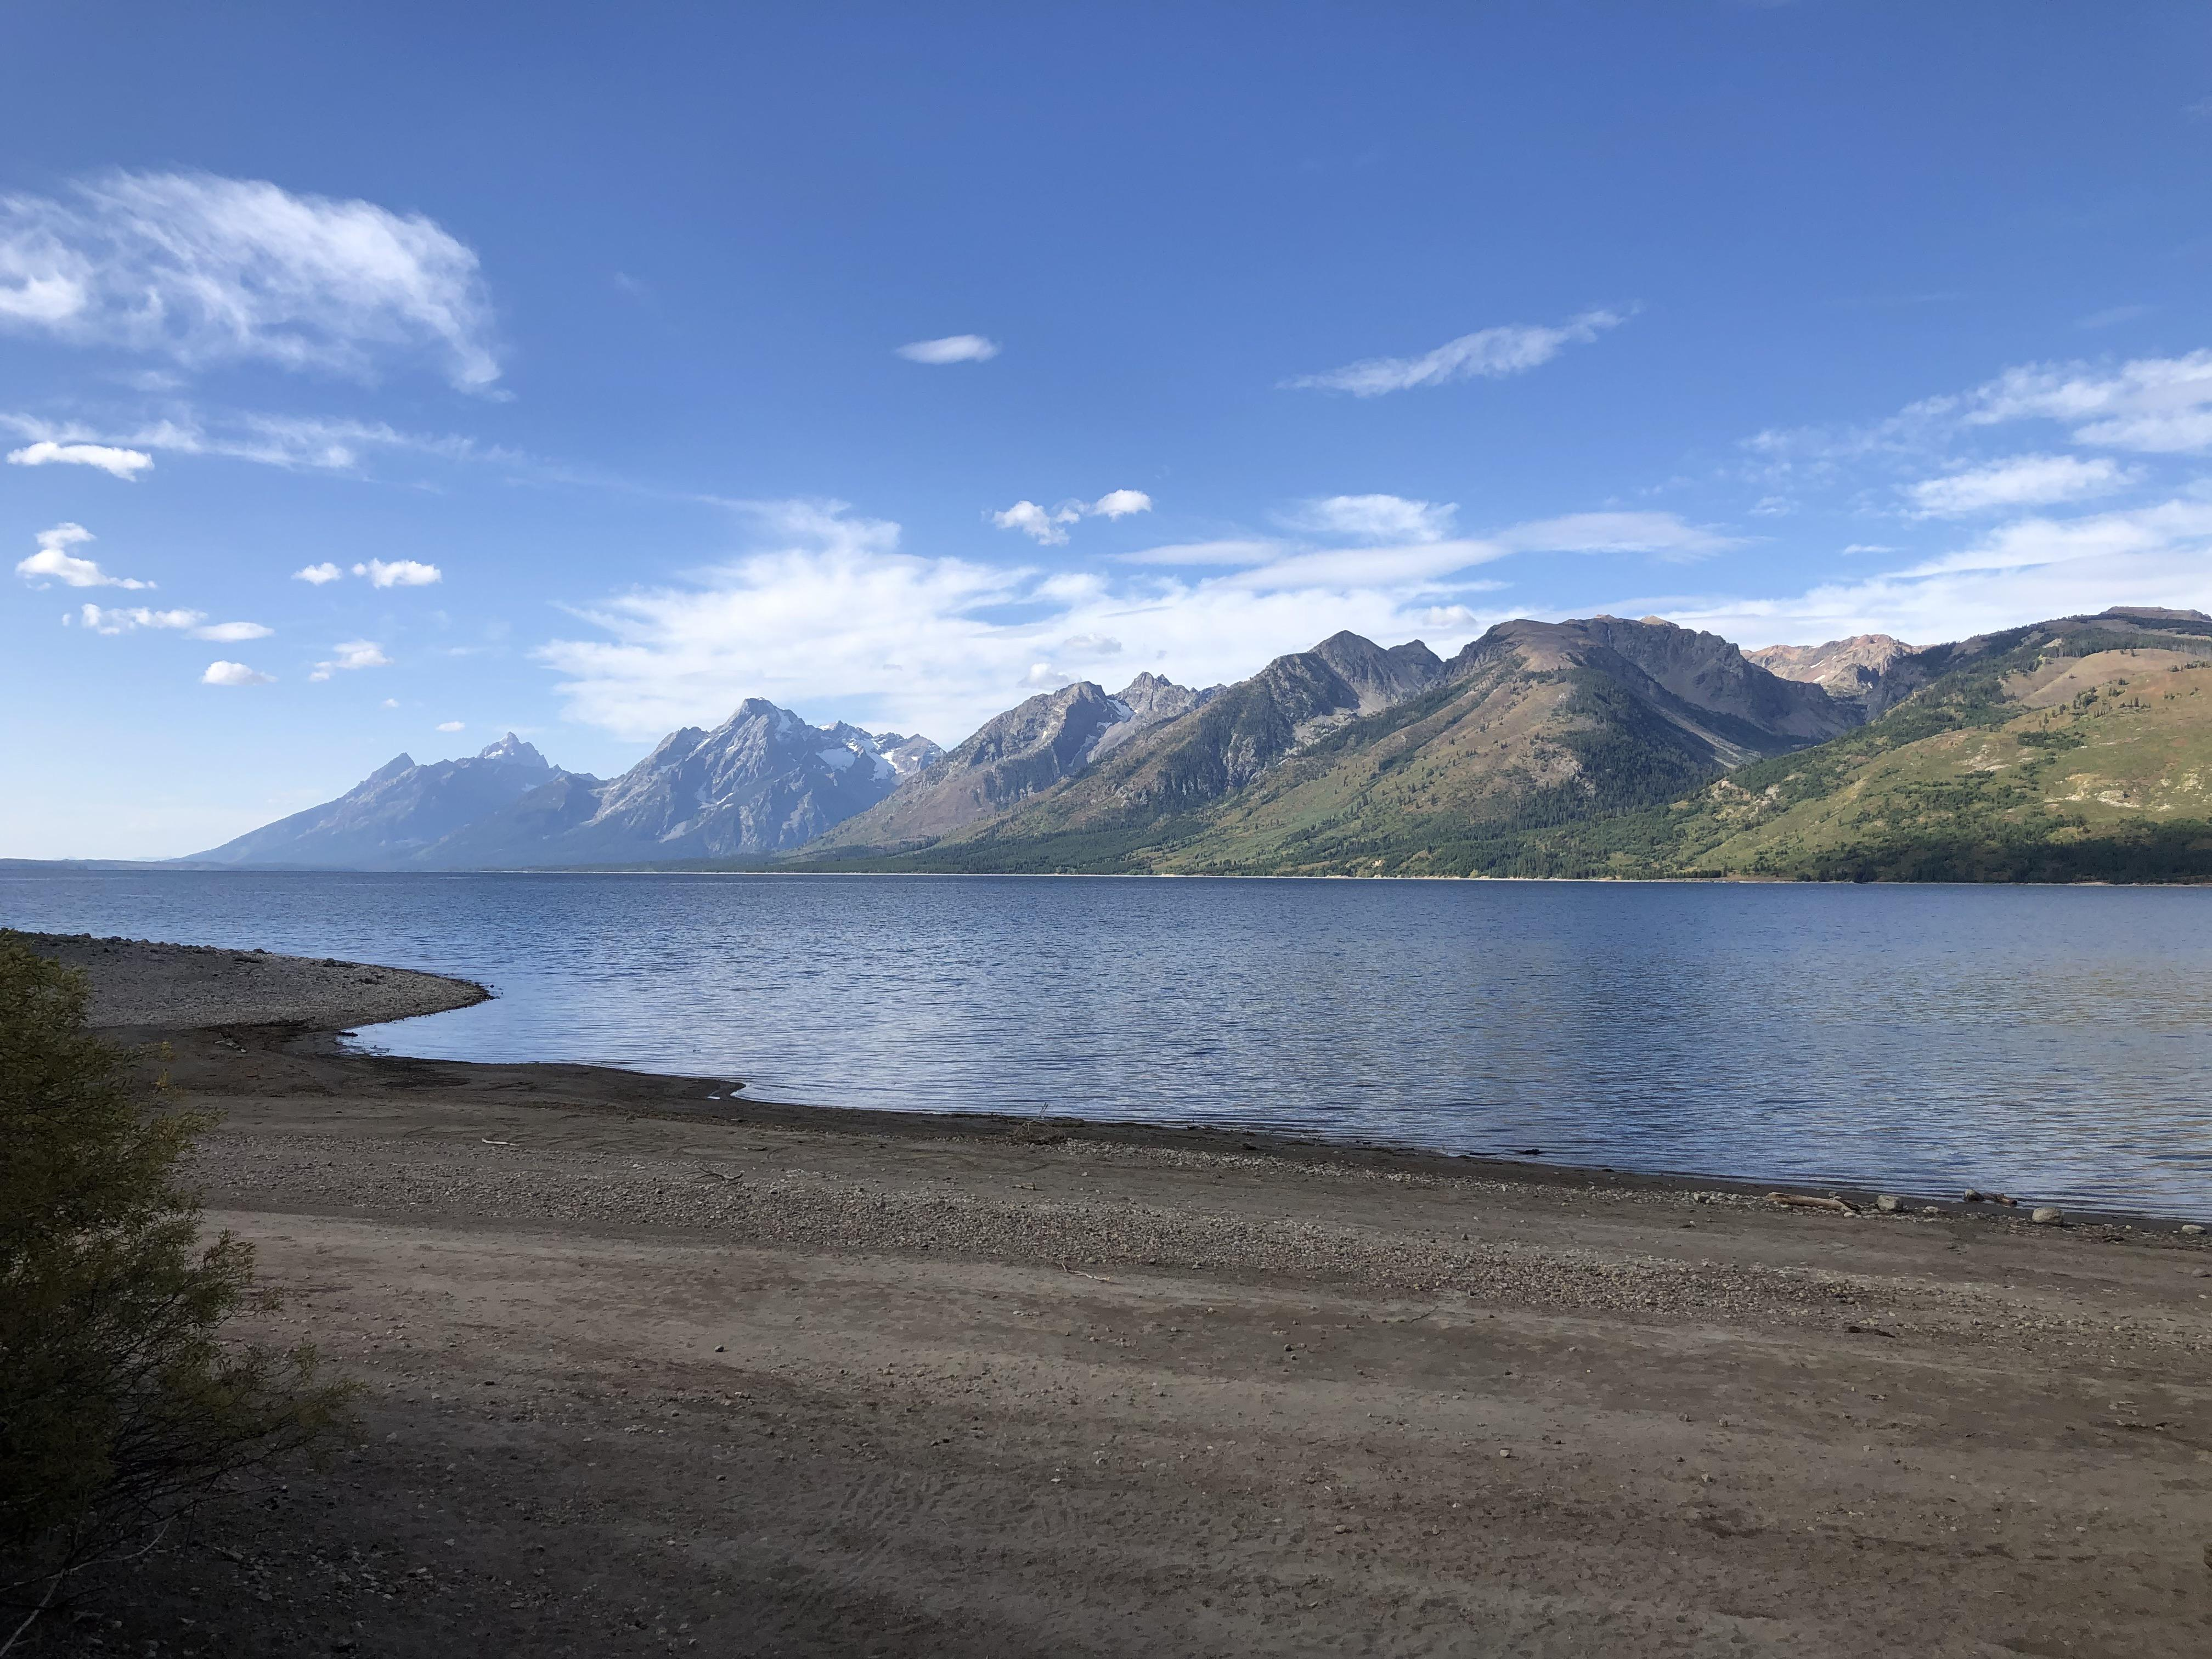 Grand Teton National Park 4k Wallpaper